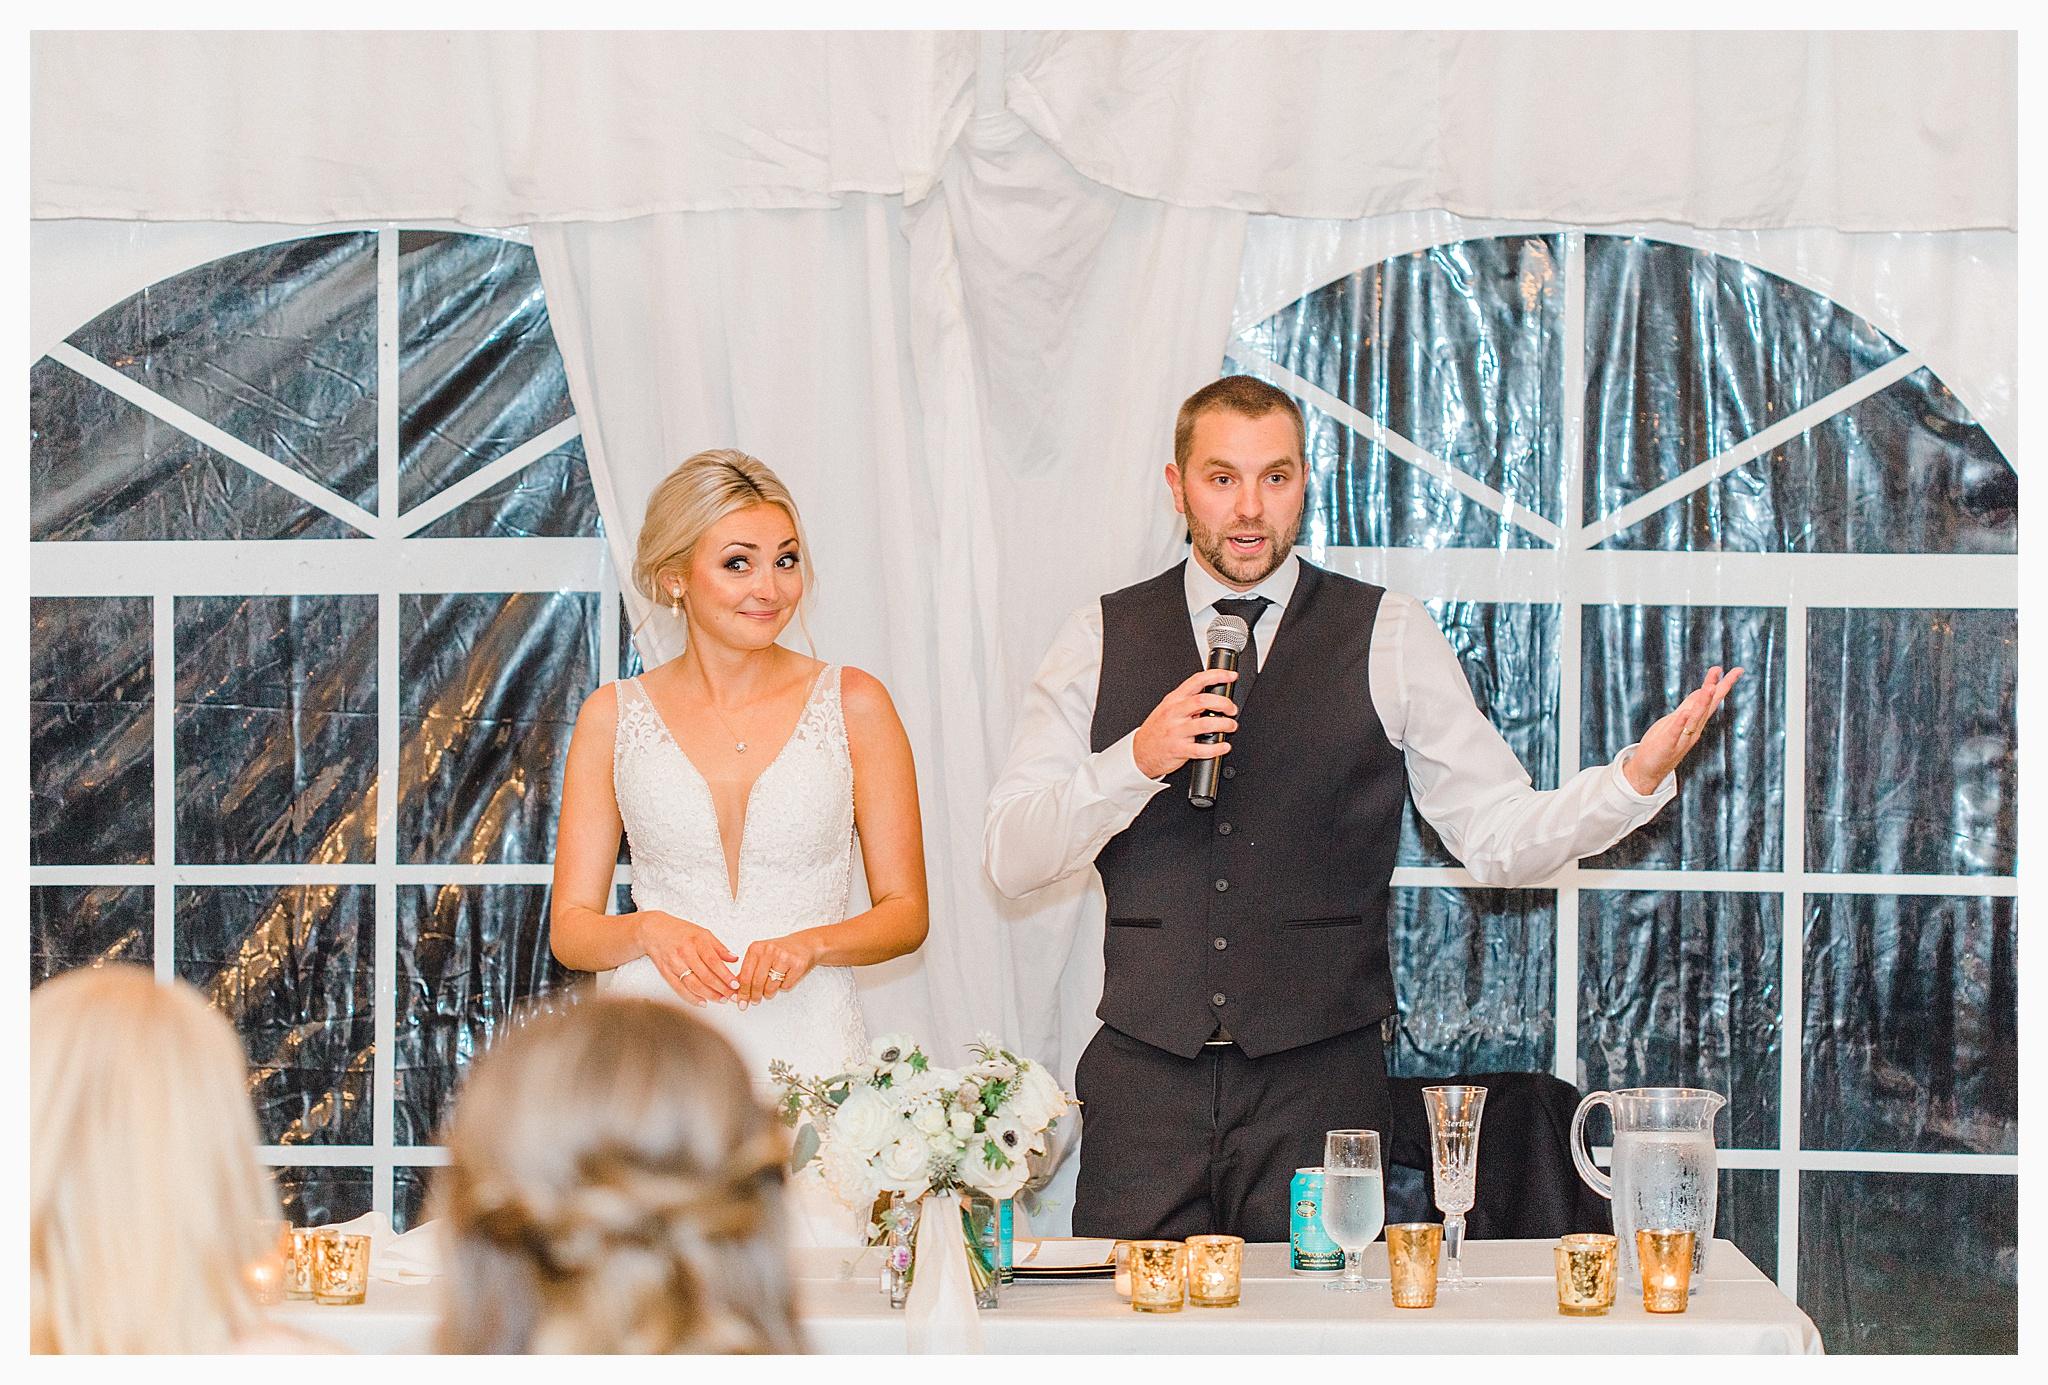 Emma Rose Company Light and Airy Wedding Photographer, Beautiful fall wedding at Rock Creek Gardens Venue in Puyallup, Washington._0101.jpg